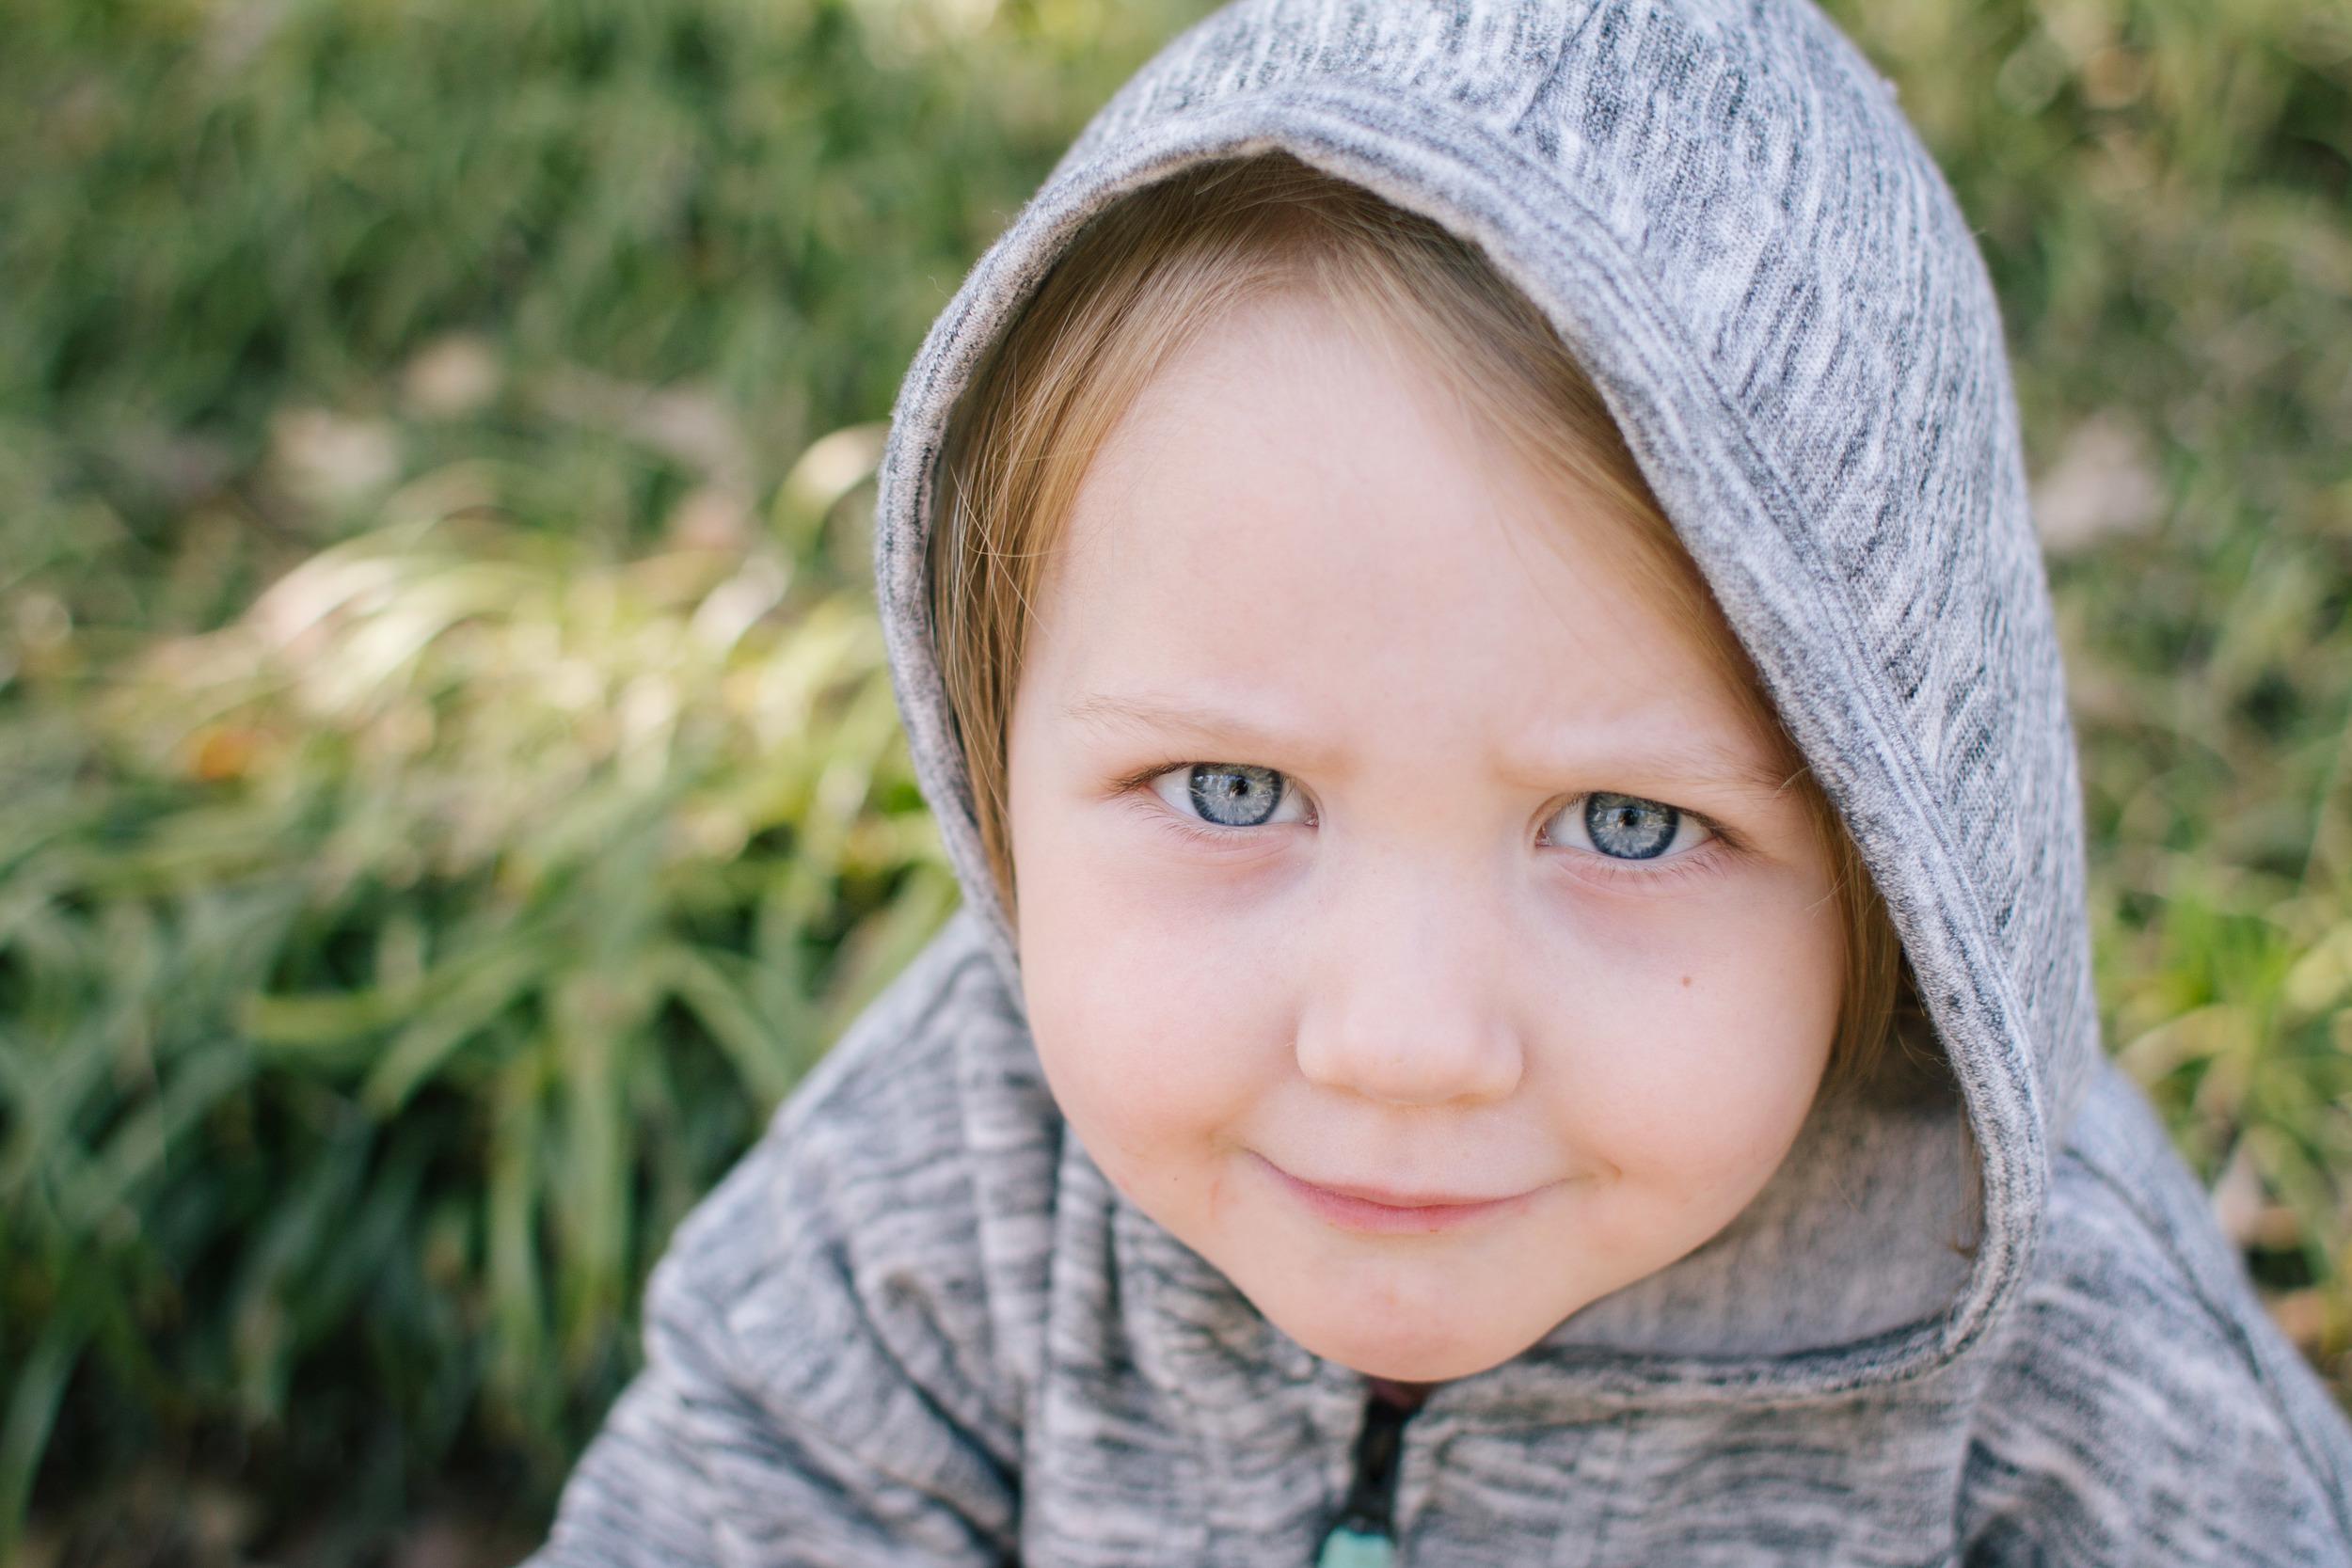 jenn pierce, atlanta ga family photographer